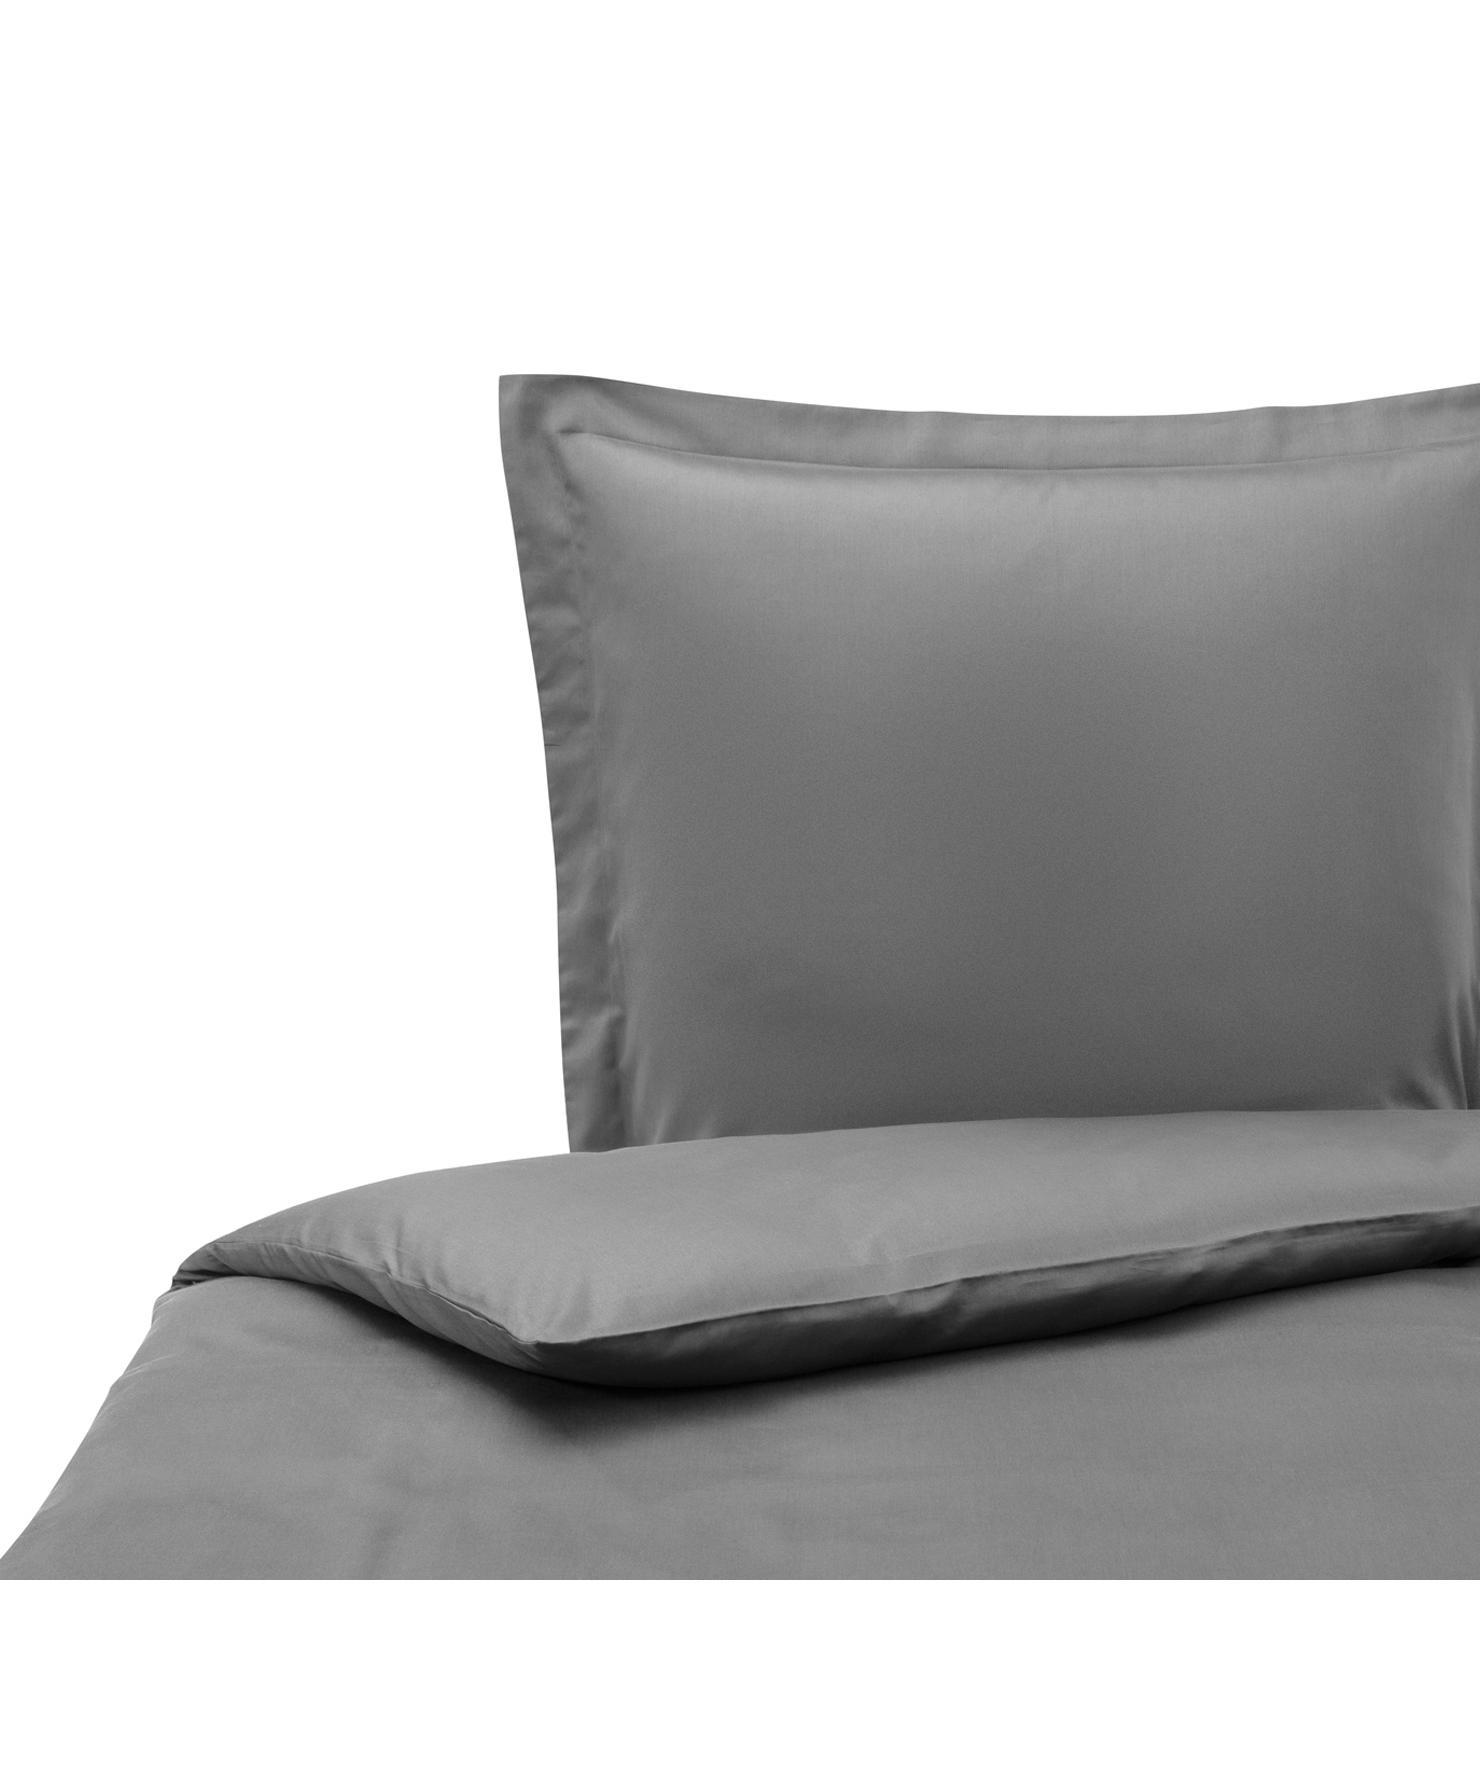 Funda nórdica de satén Premium, Gris oscuro, Cama 90 cm (150 x 200 cm)